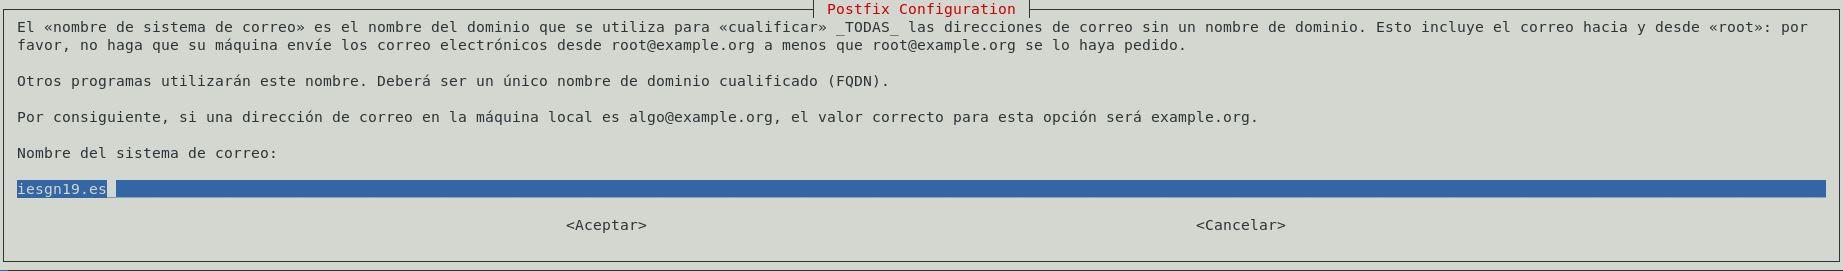 postfix2